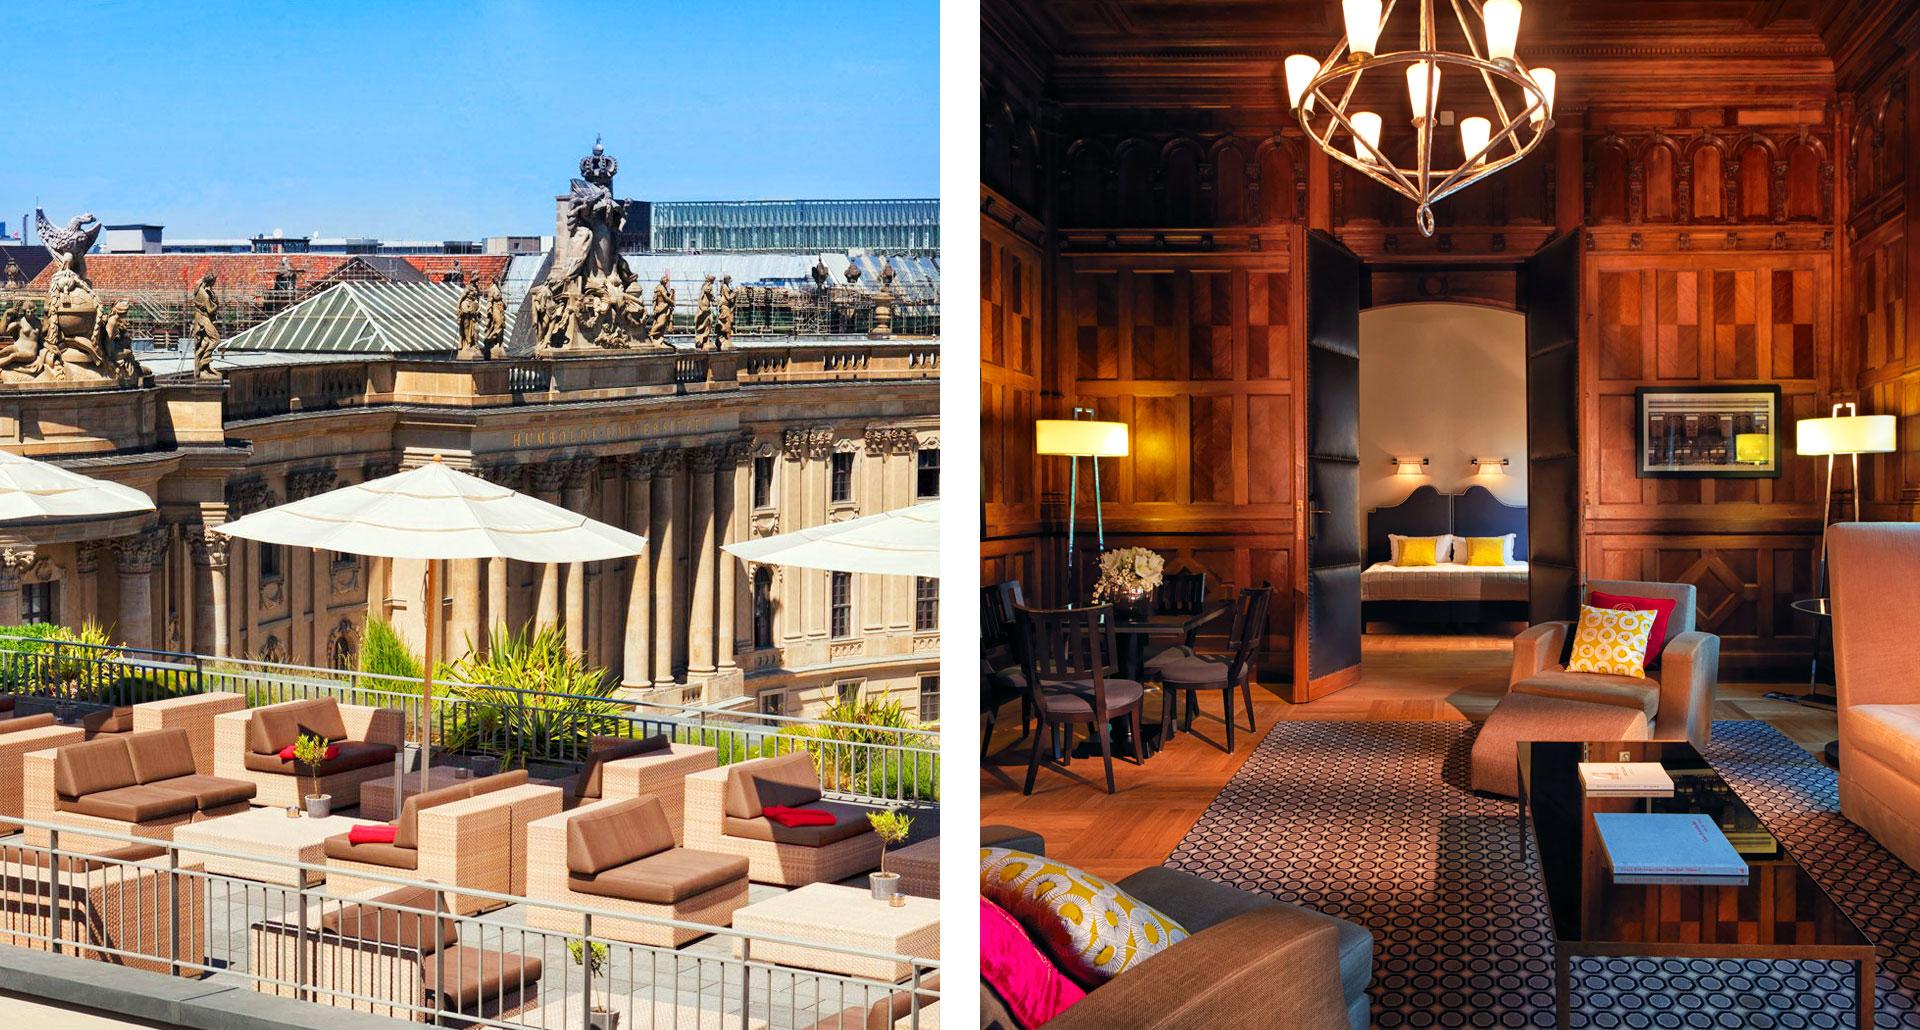 Hotel De Rome - boutique hotel in Berlin